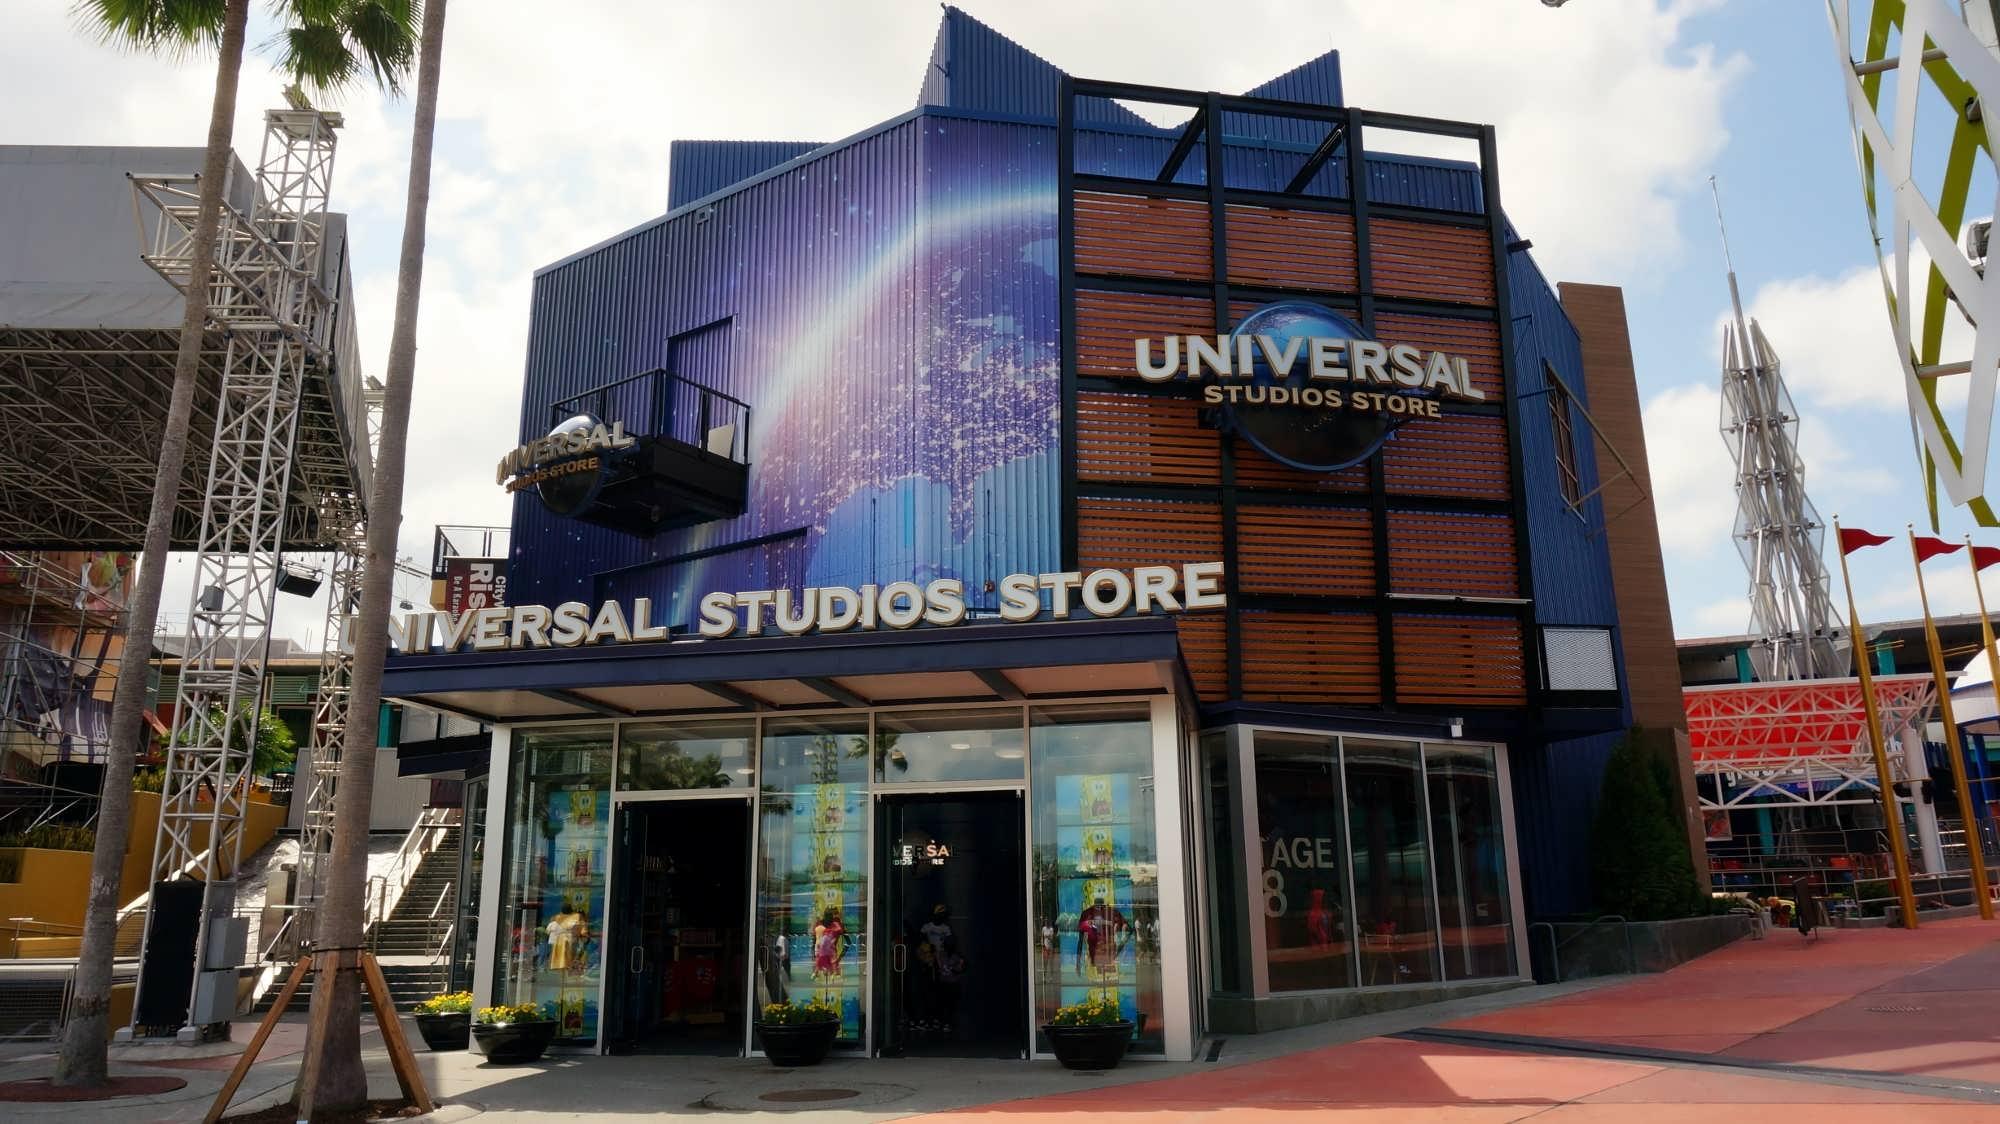 Universal Studios Store – Universal CityWalk.